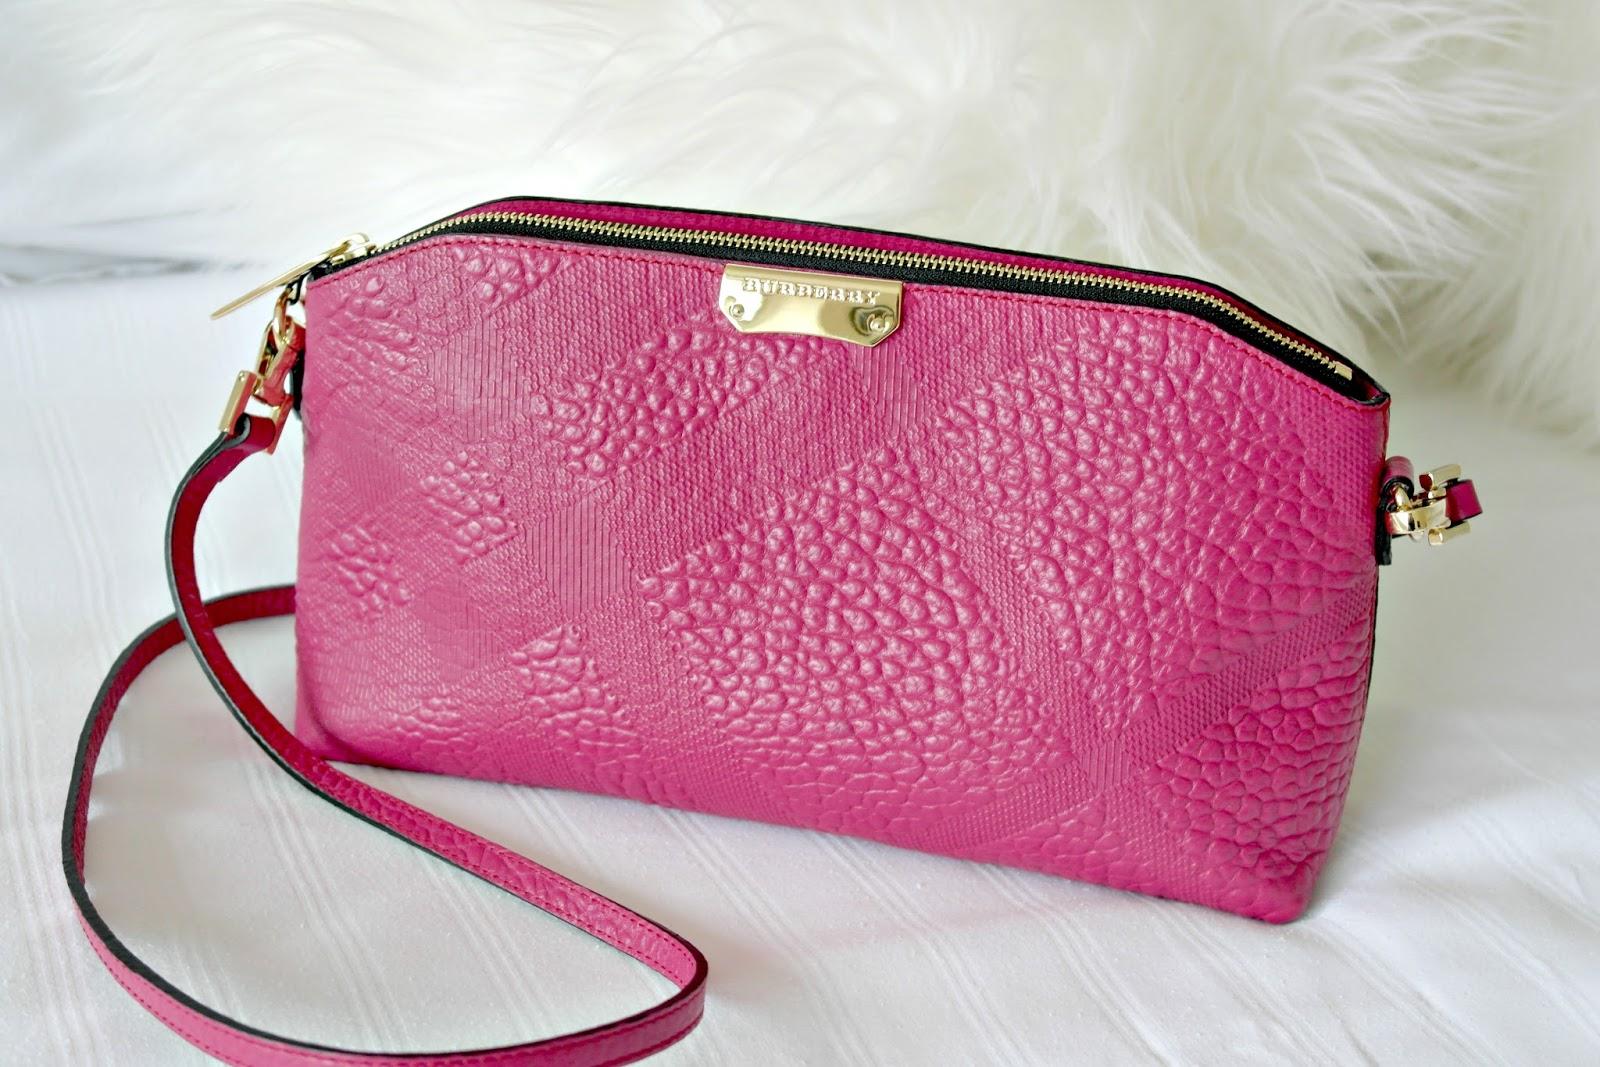 Pink Burberry Clutch Handbag - Devoted To Pink f4524aea207dd